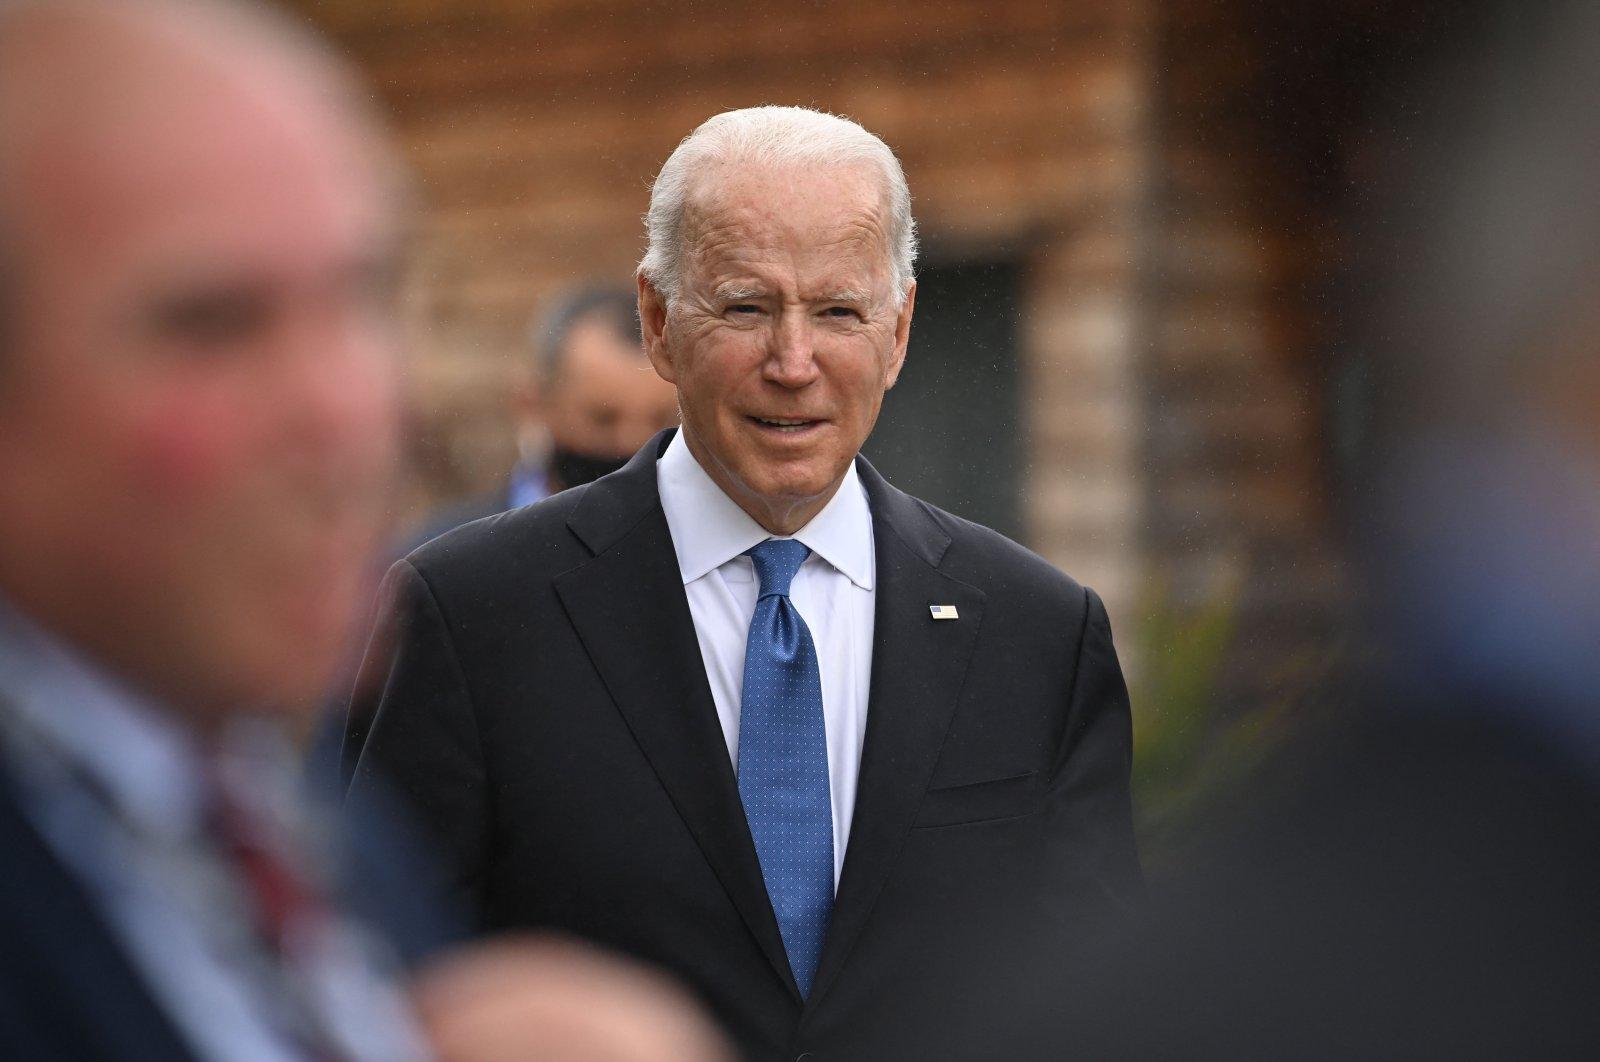 US President Joe Biden attends the G7 summit in Carbis Bay, Cornwall, England, June 11, 2021. (AFP Photo)